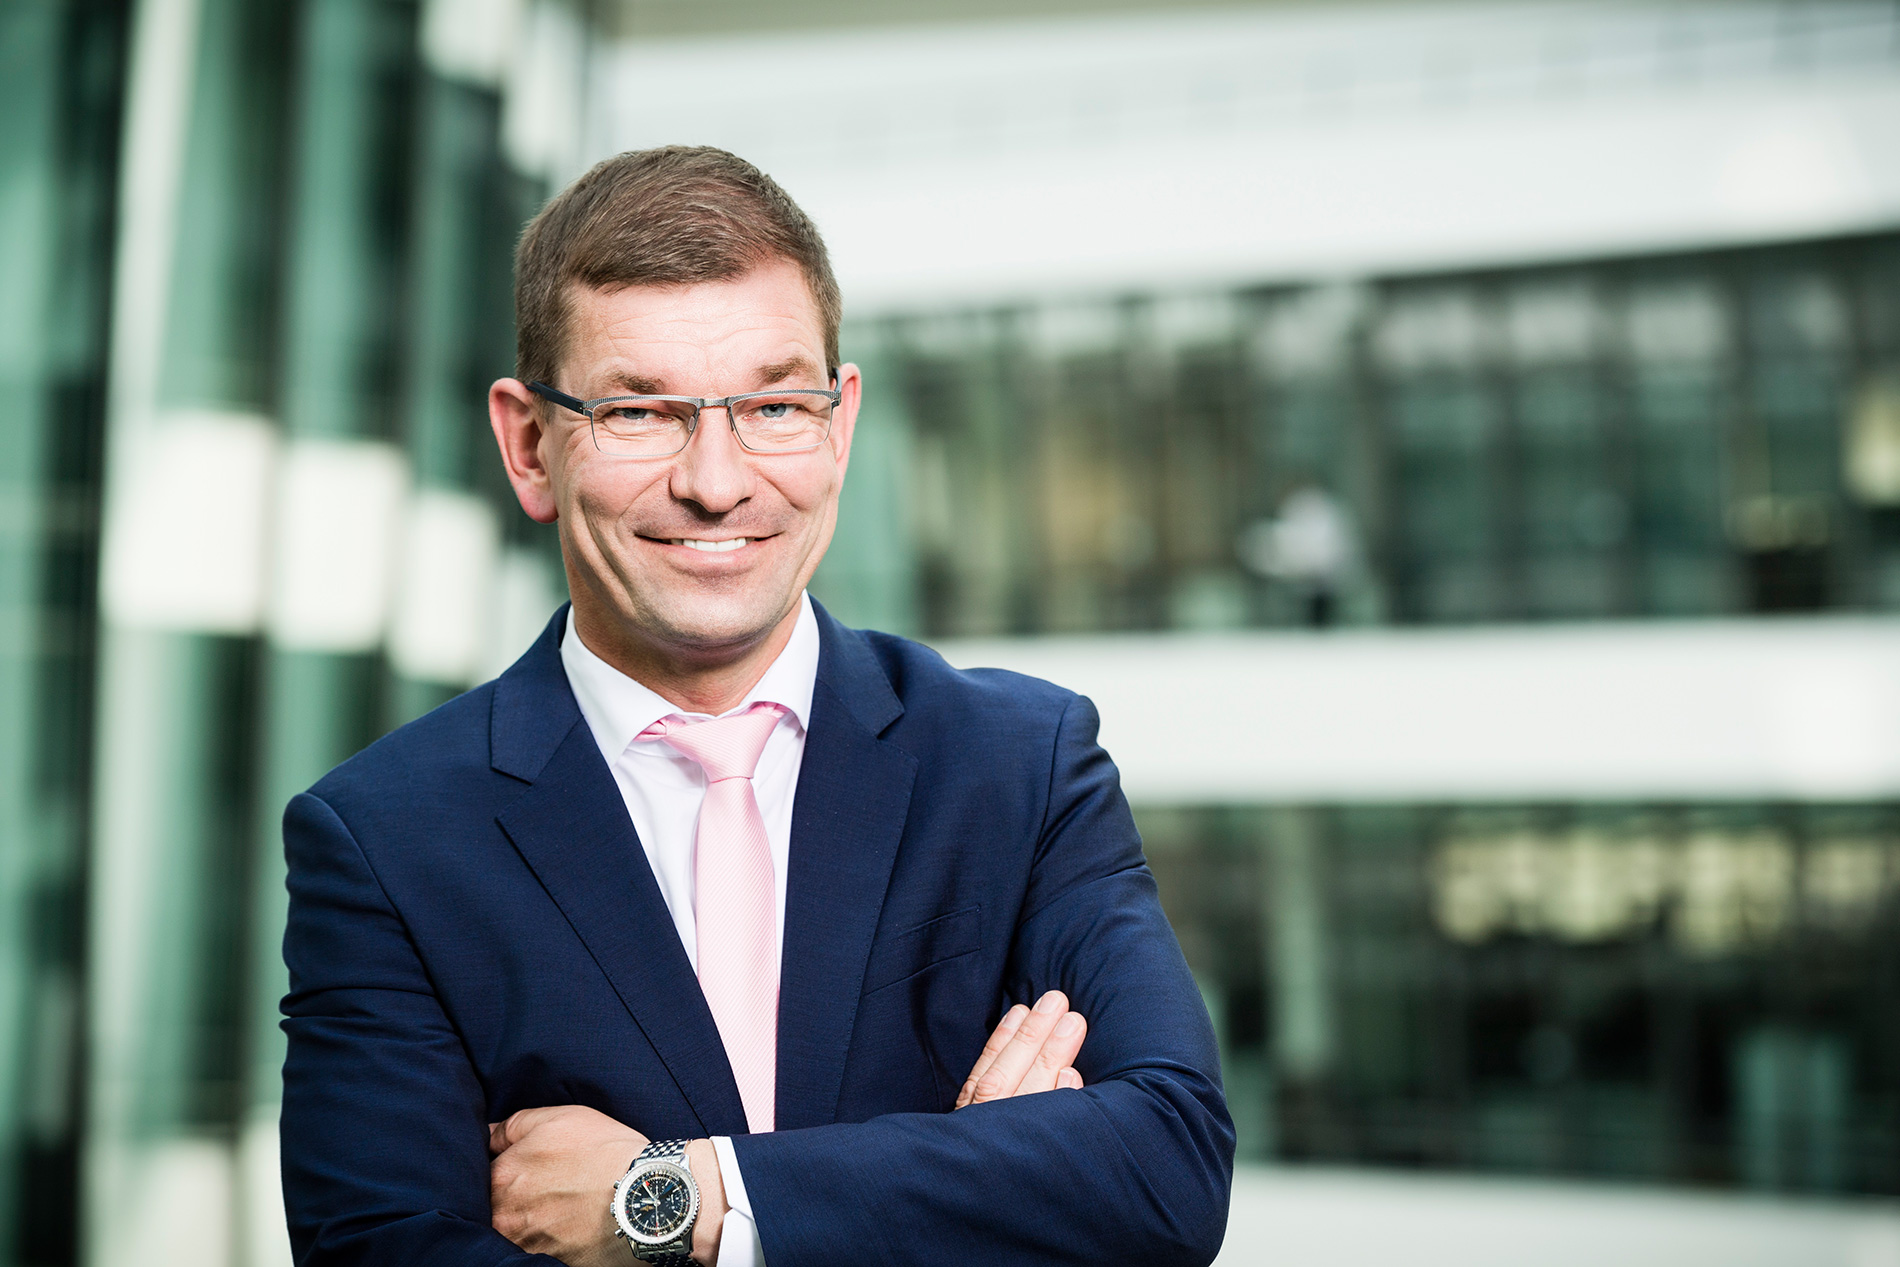 Markus Duesmann bmw